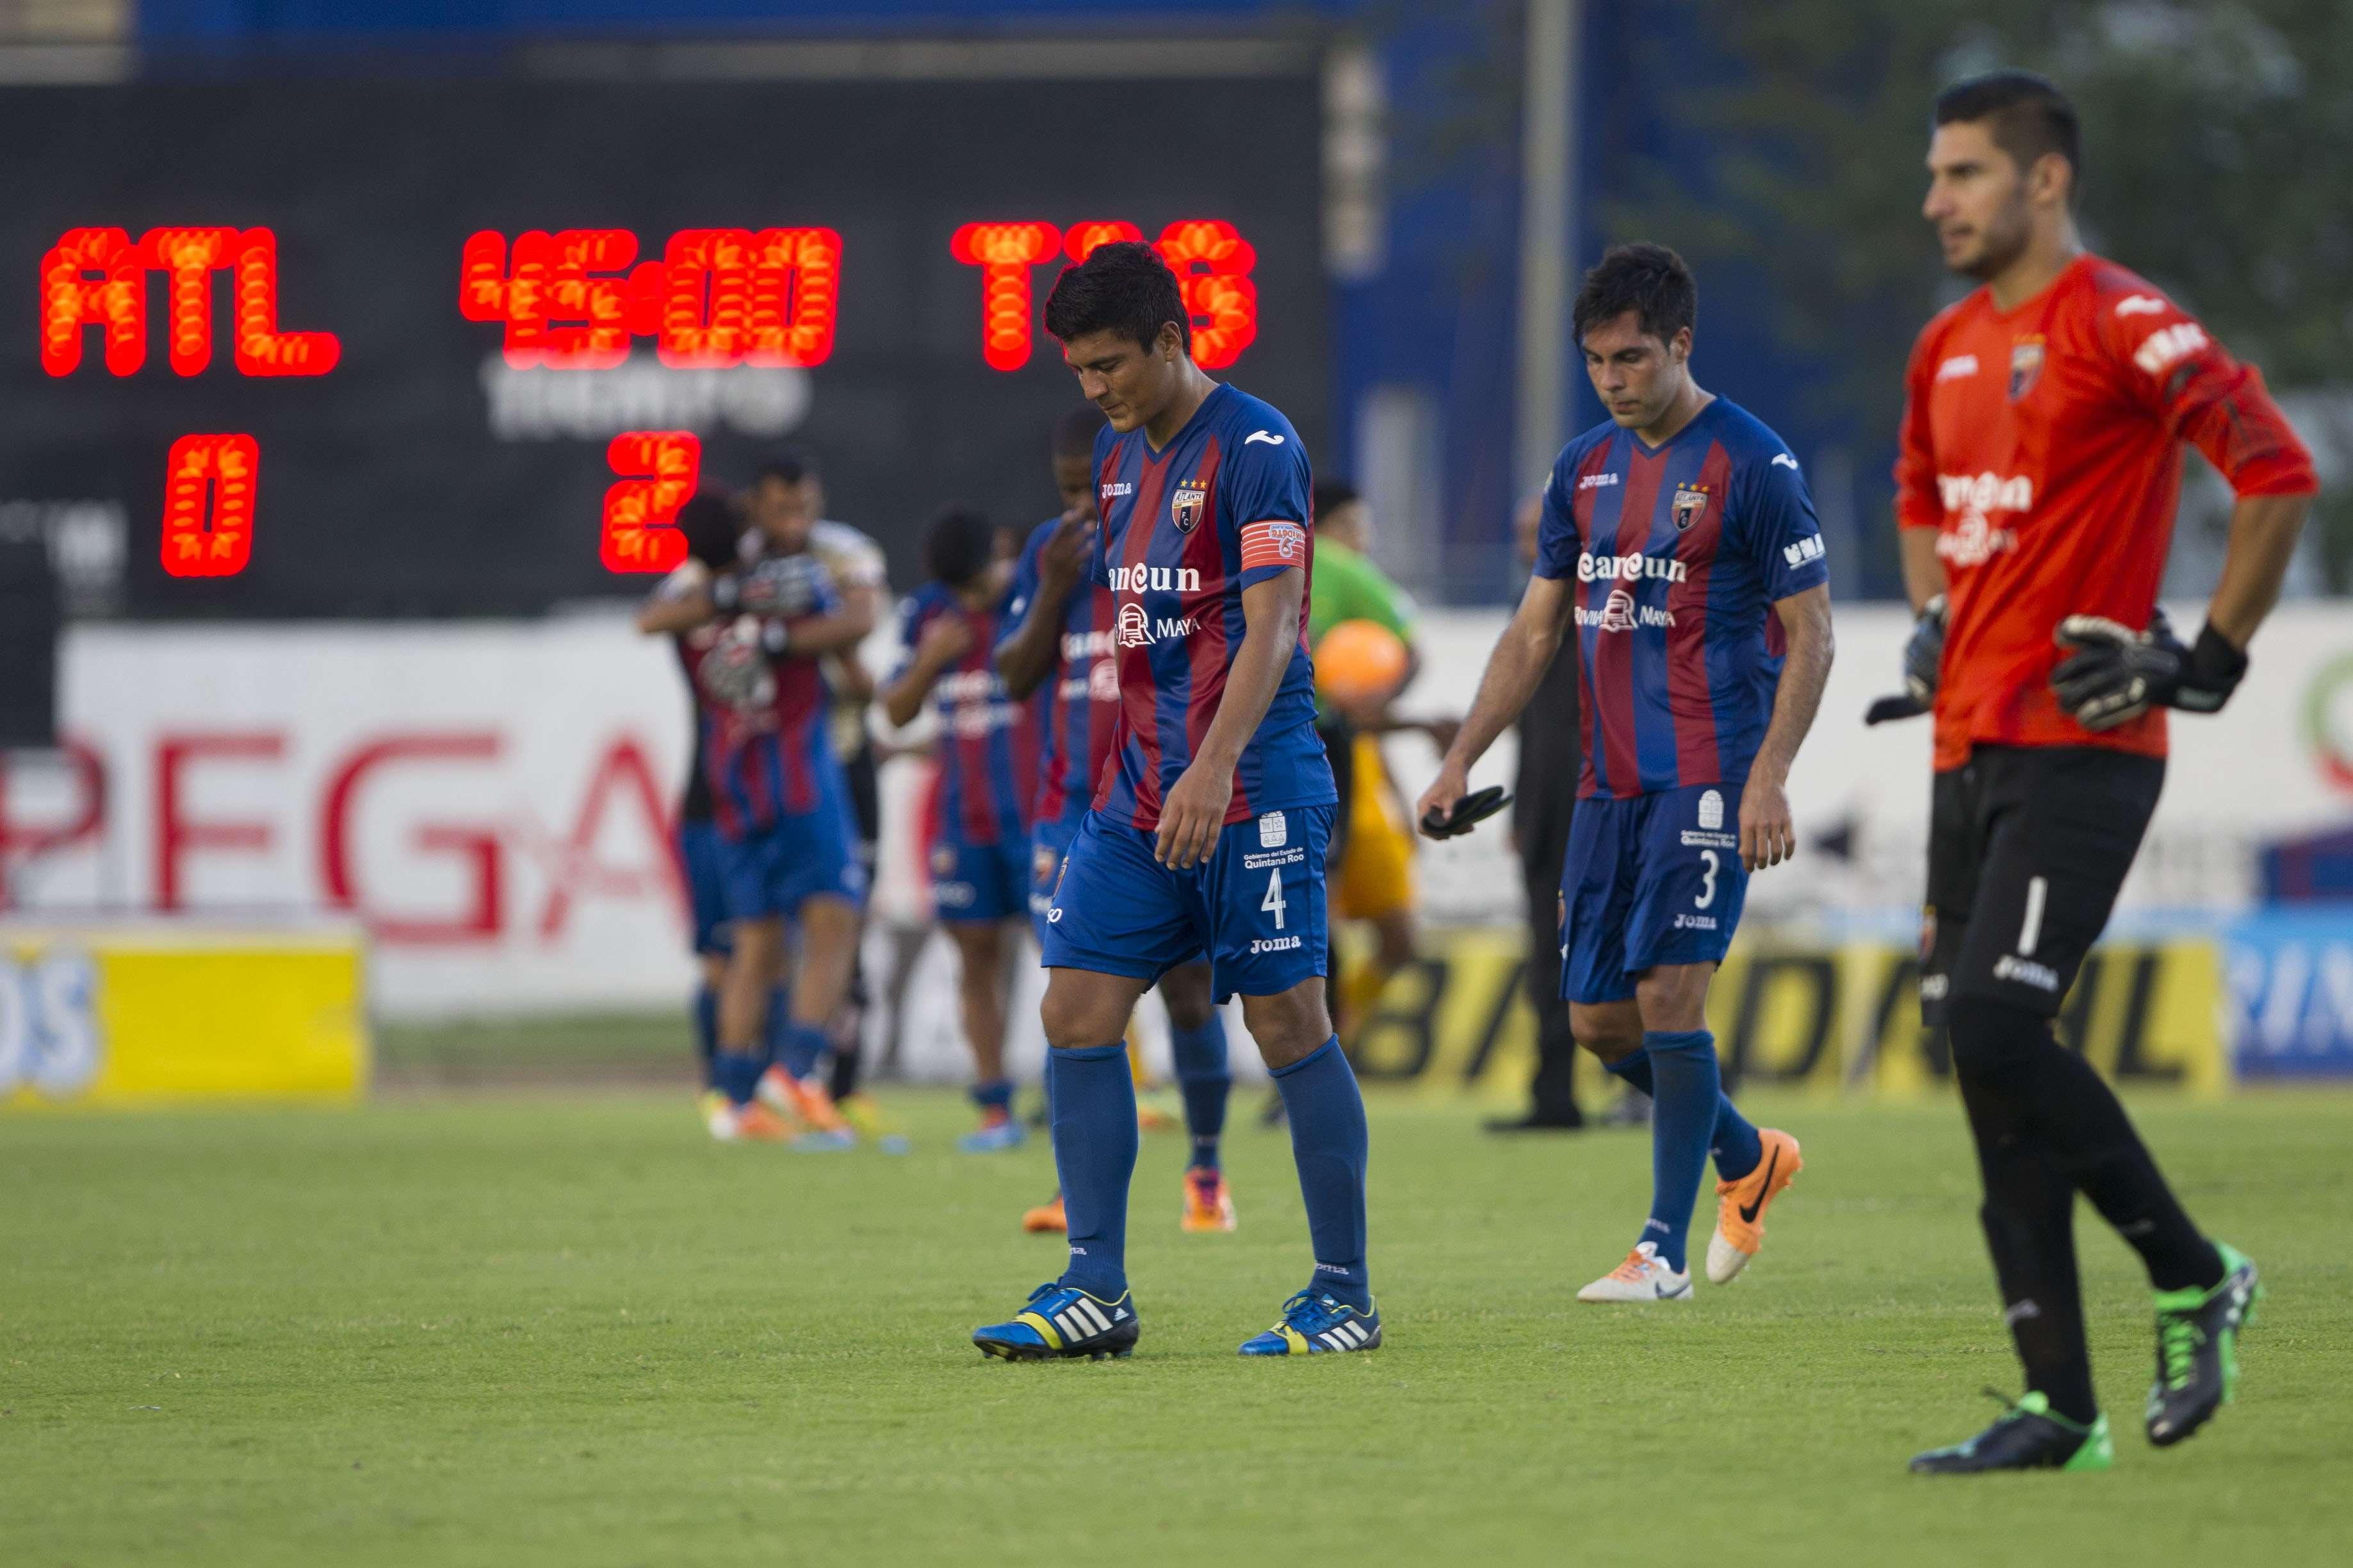 Search Results Videos Show De Goles Terra Deportes Futbol ... - photo#22